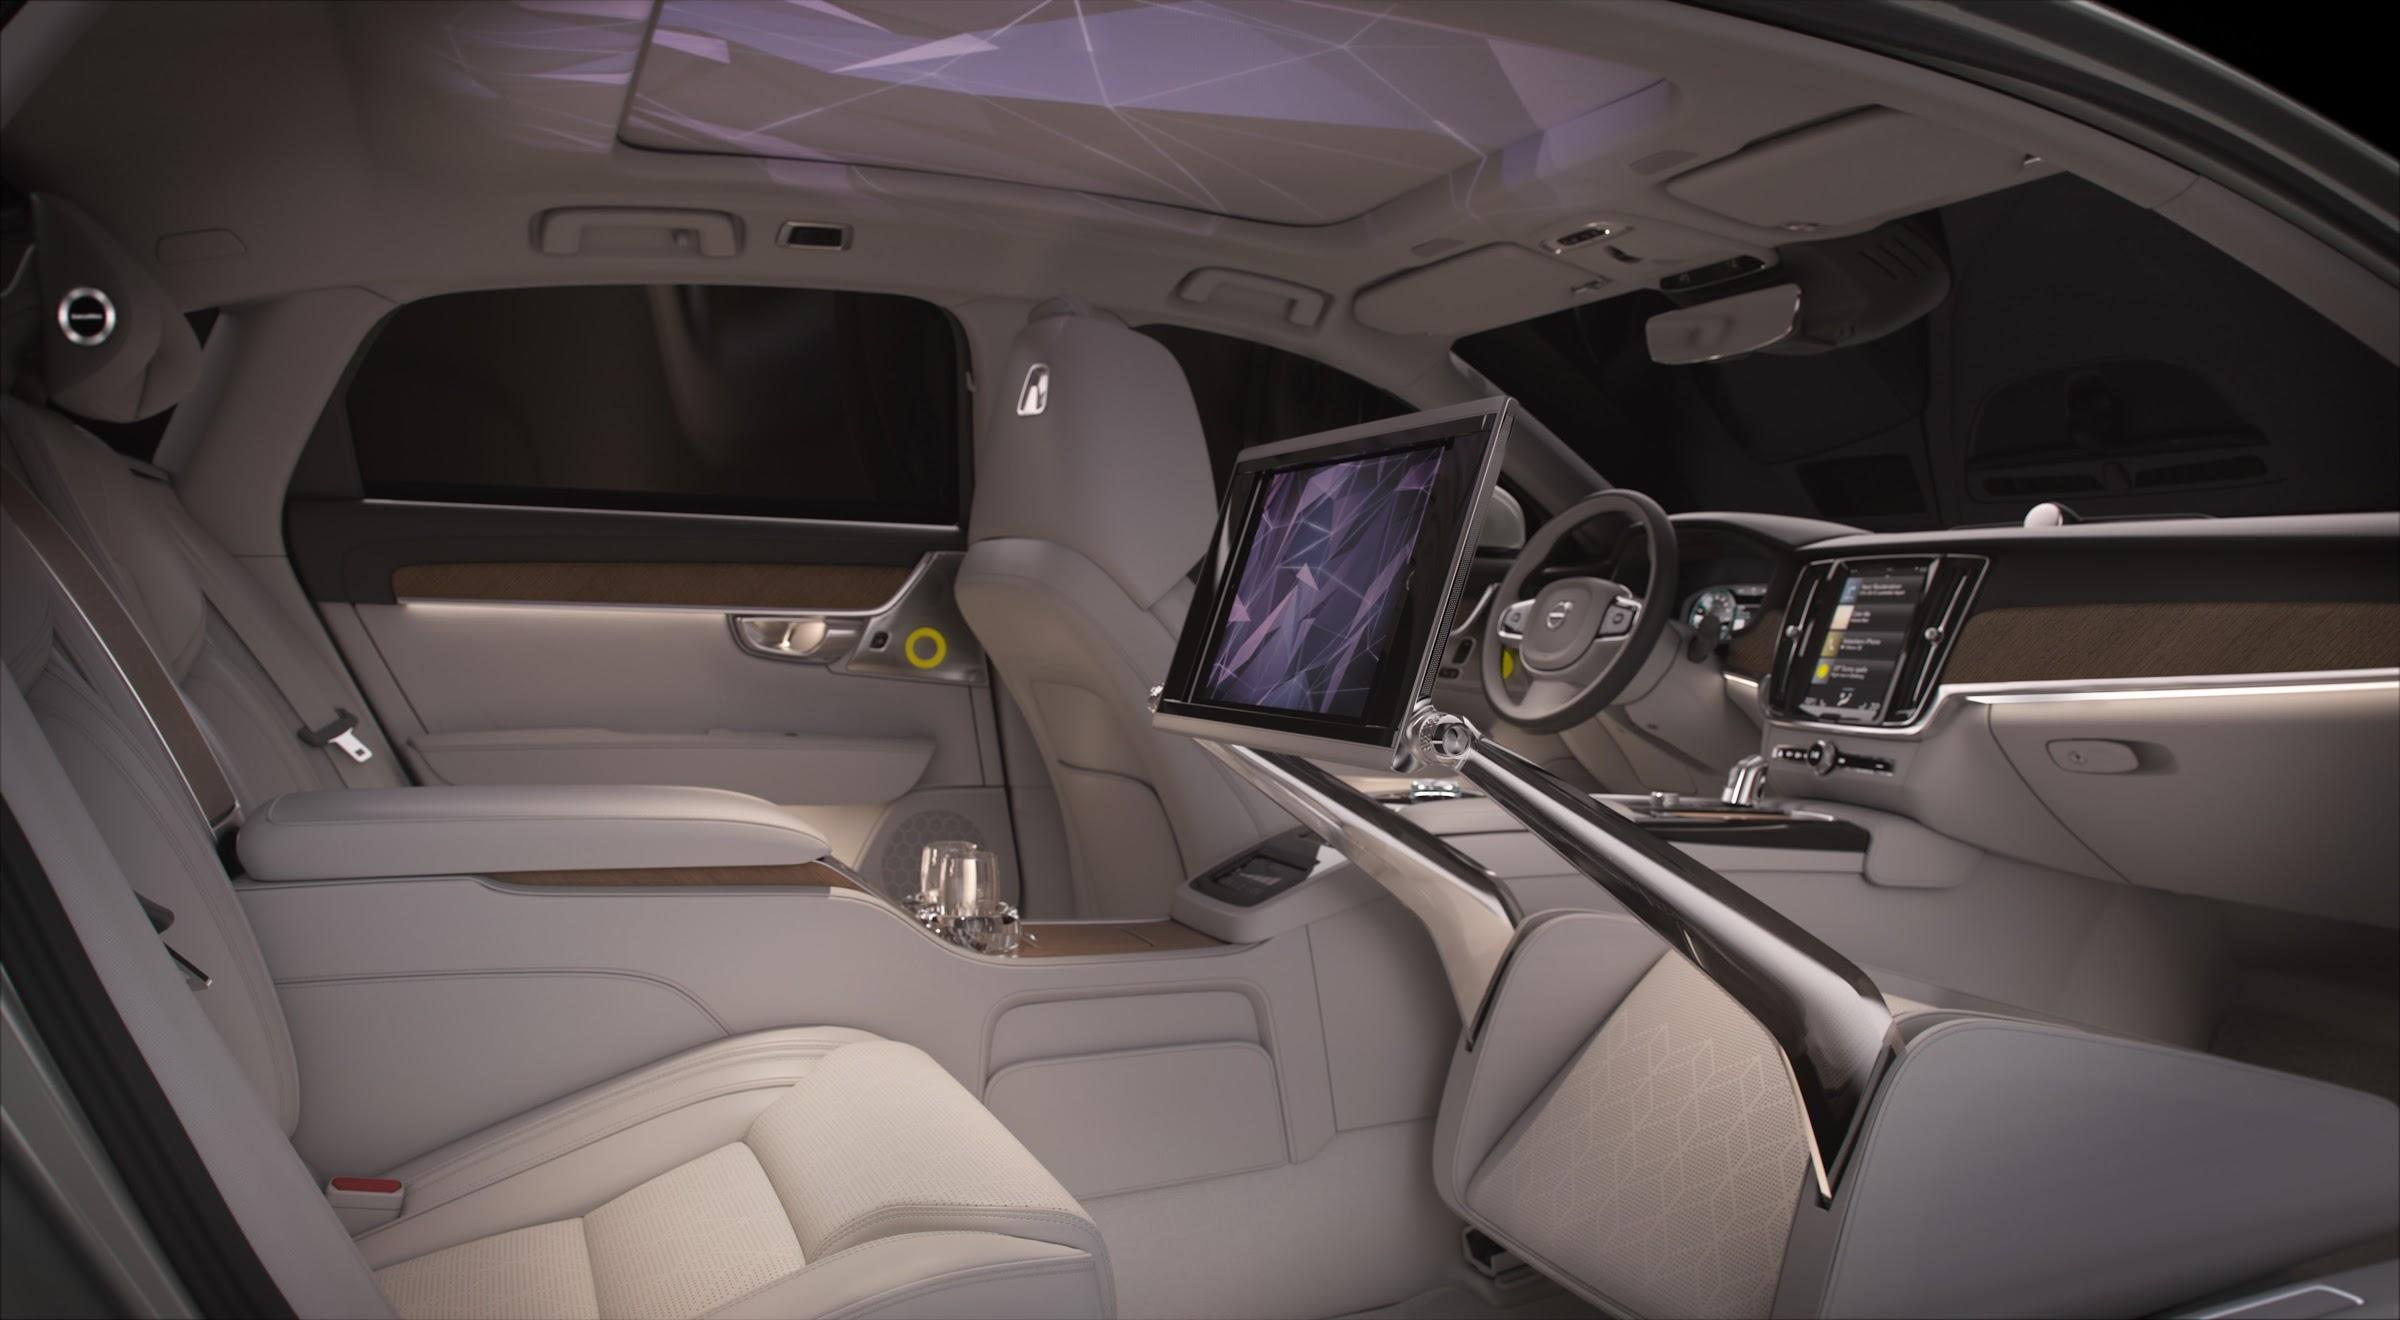 F4mT7K5MZcVcFsjhp3fg5OEPUdCZRBqub9N949rf6oAMV6rsJBQccZizdxACoscCBVCJcPRCkImExZeQceAELt6sRhOuP2zKpP5pMkiT4muawtQQ9UGaFRjiQRjpLpuGpSCHg3vCcQ=w2400 - Volvo S90 Ambience Concept, una experiencia sensorial